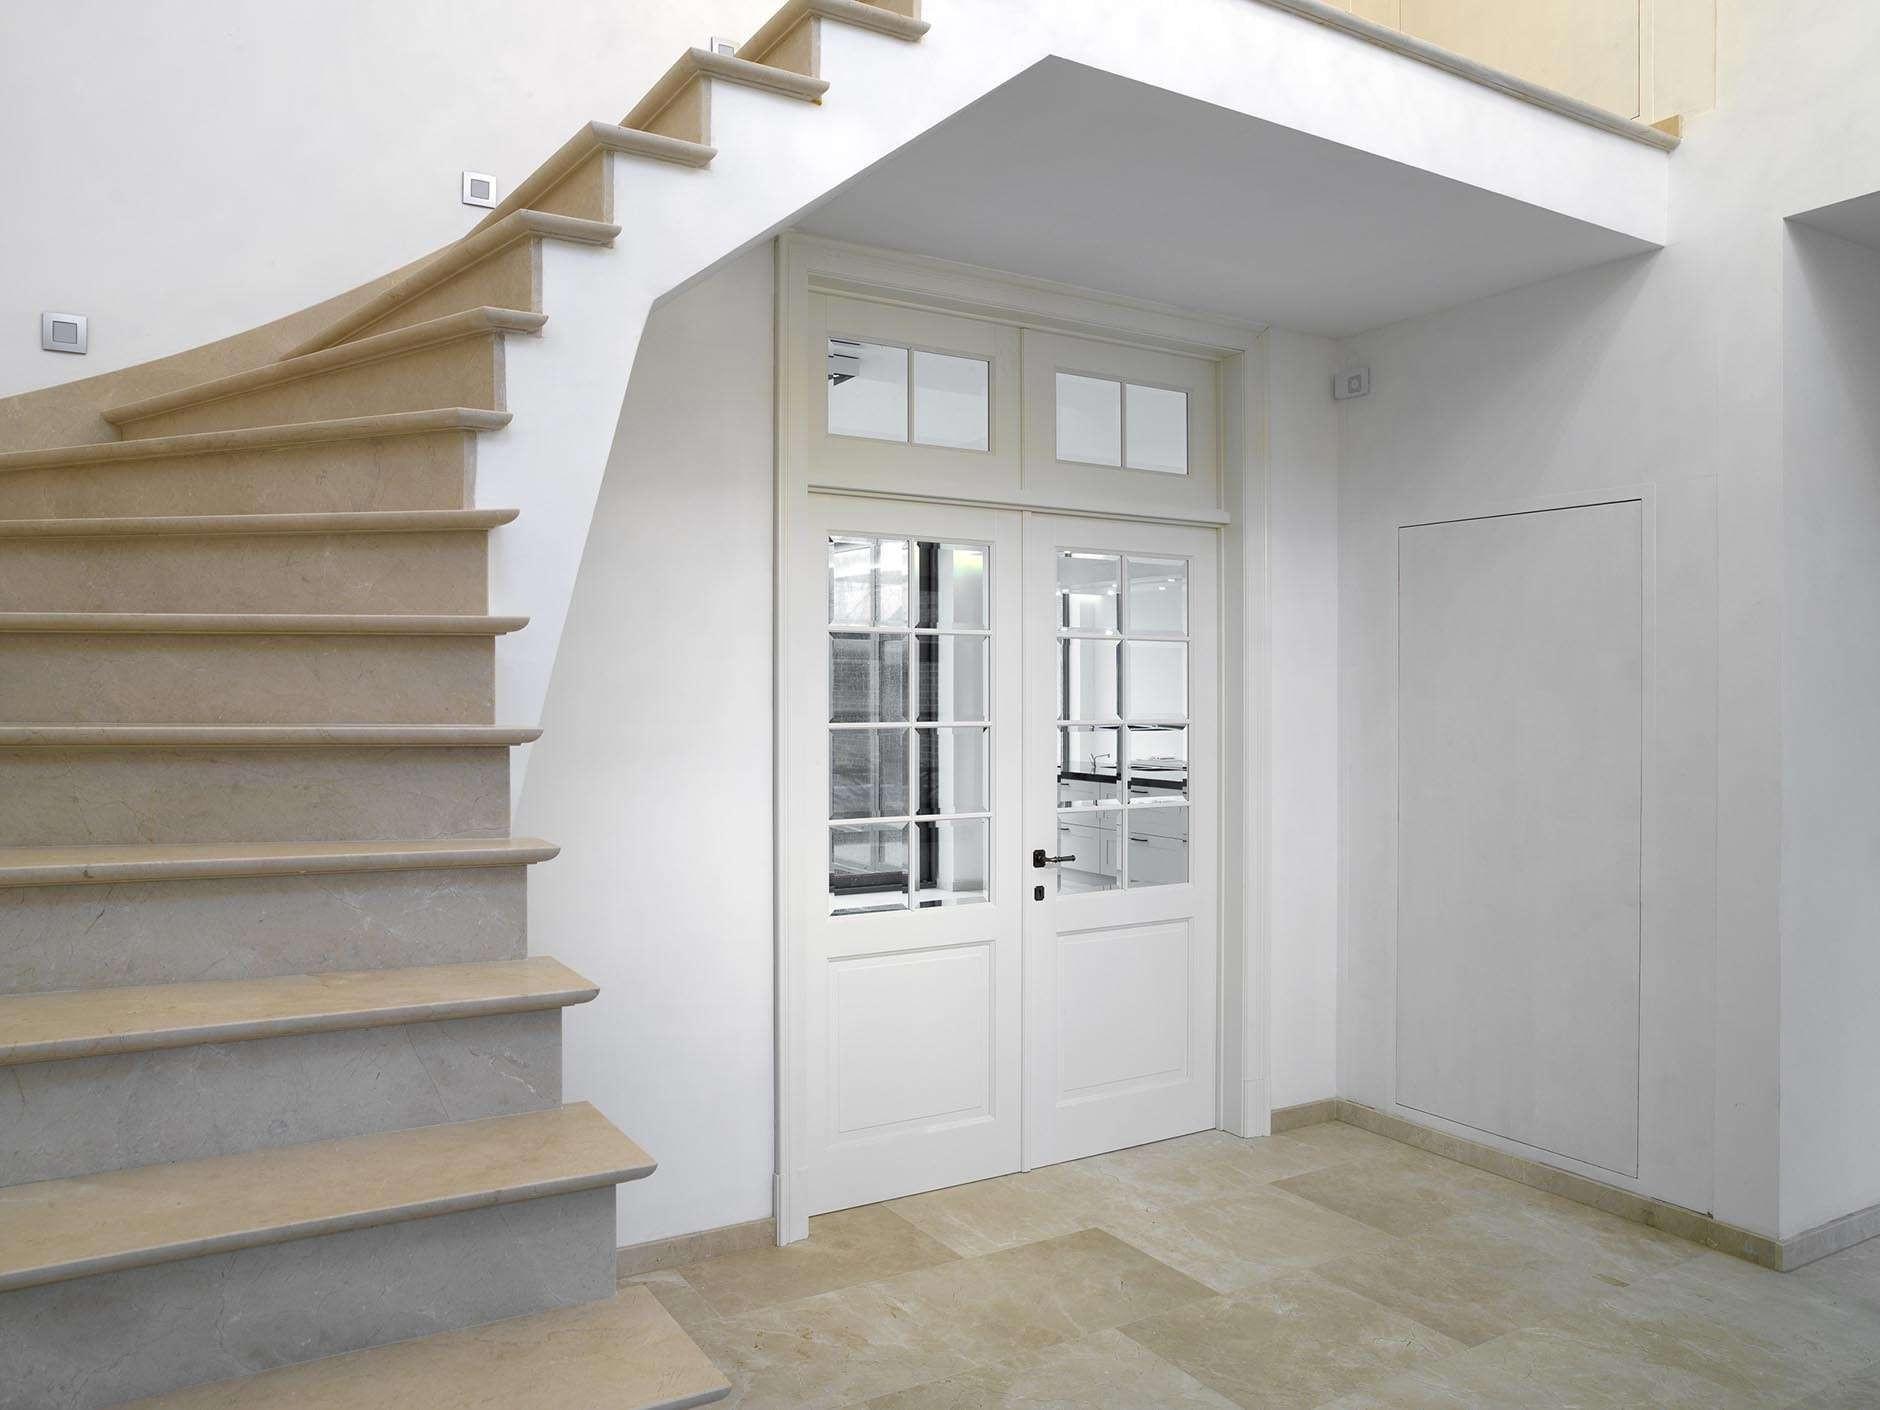 dubbele-hoge-binnendeur-glas-wit-gelakt